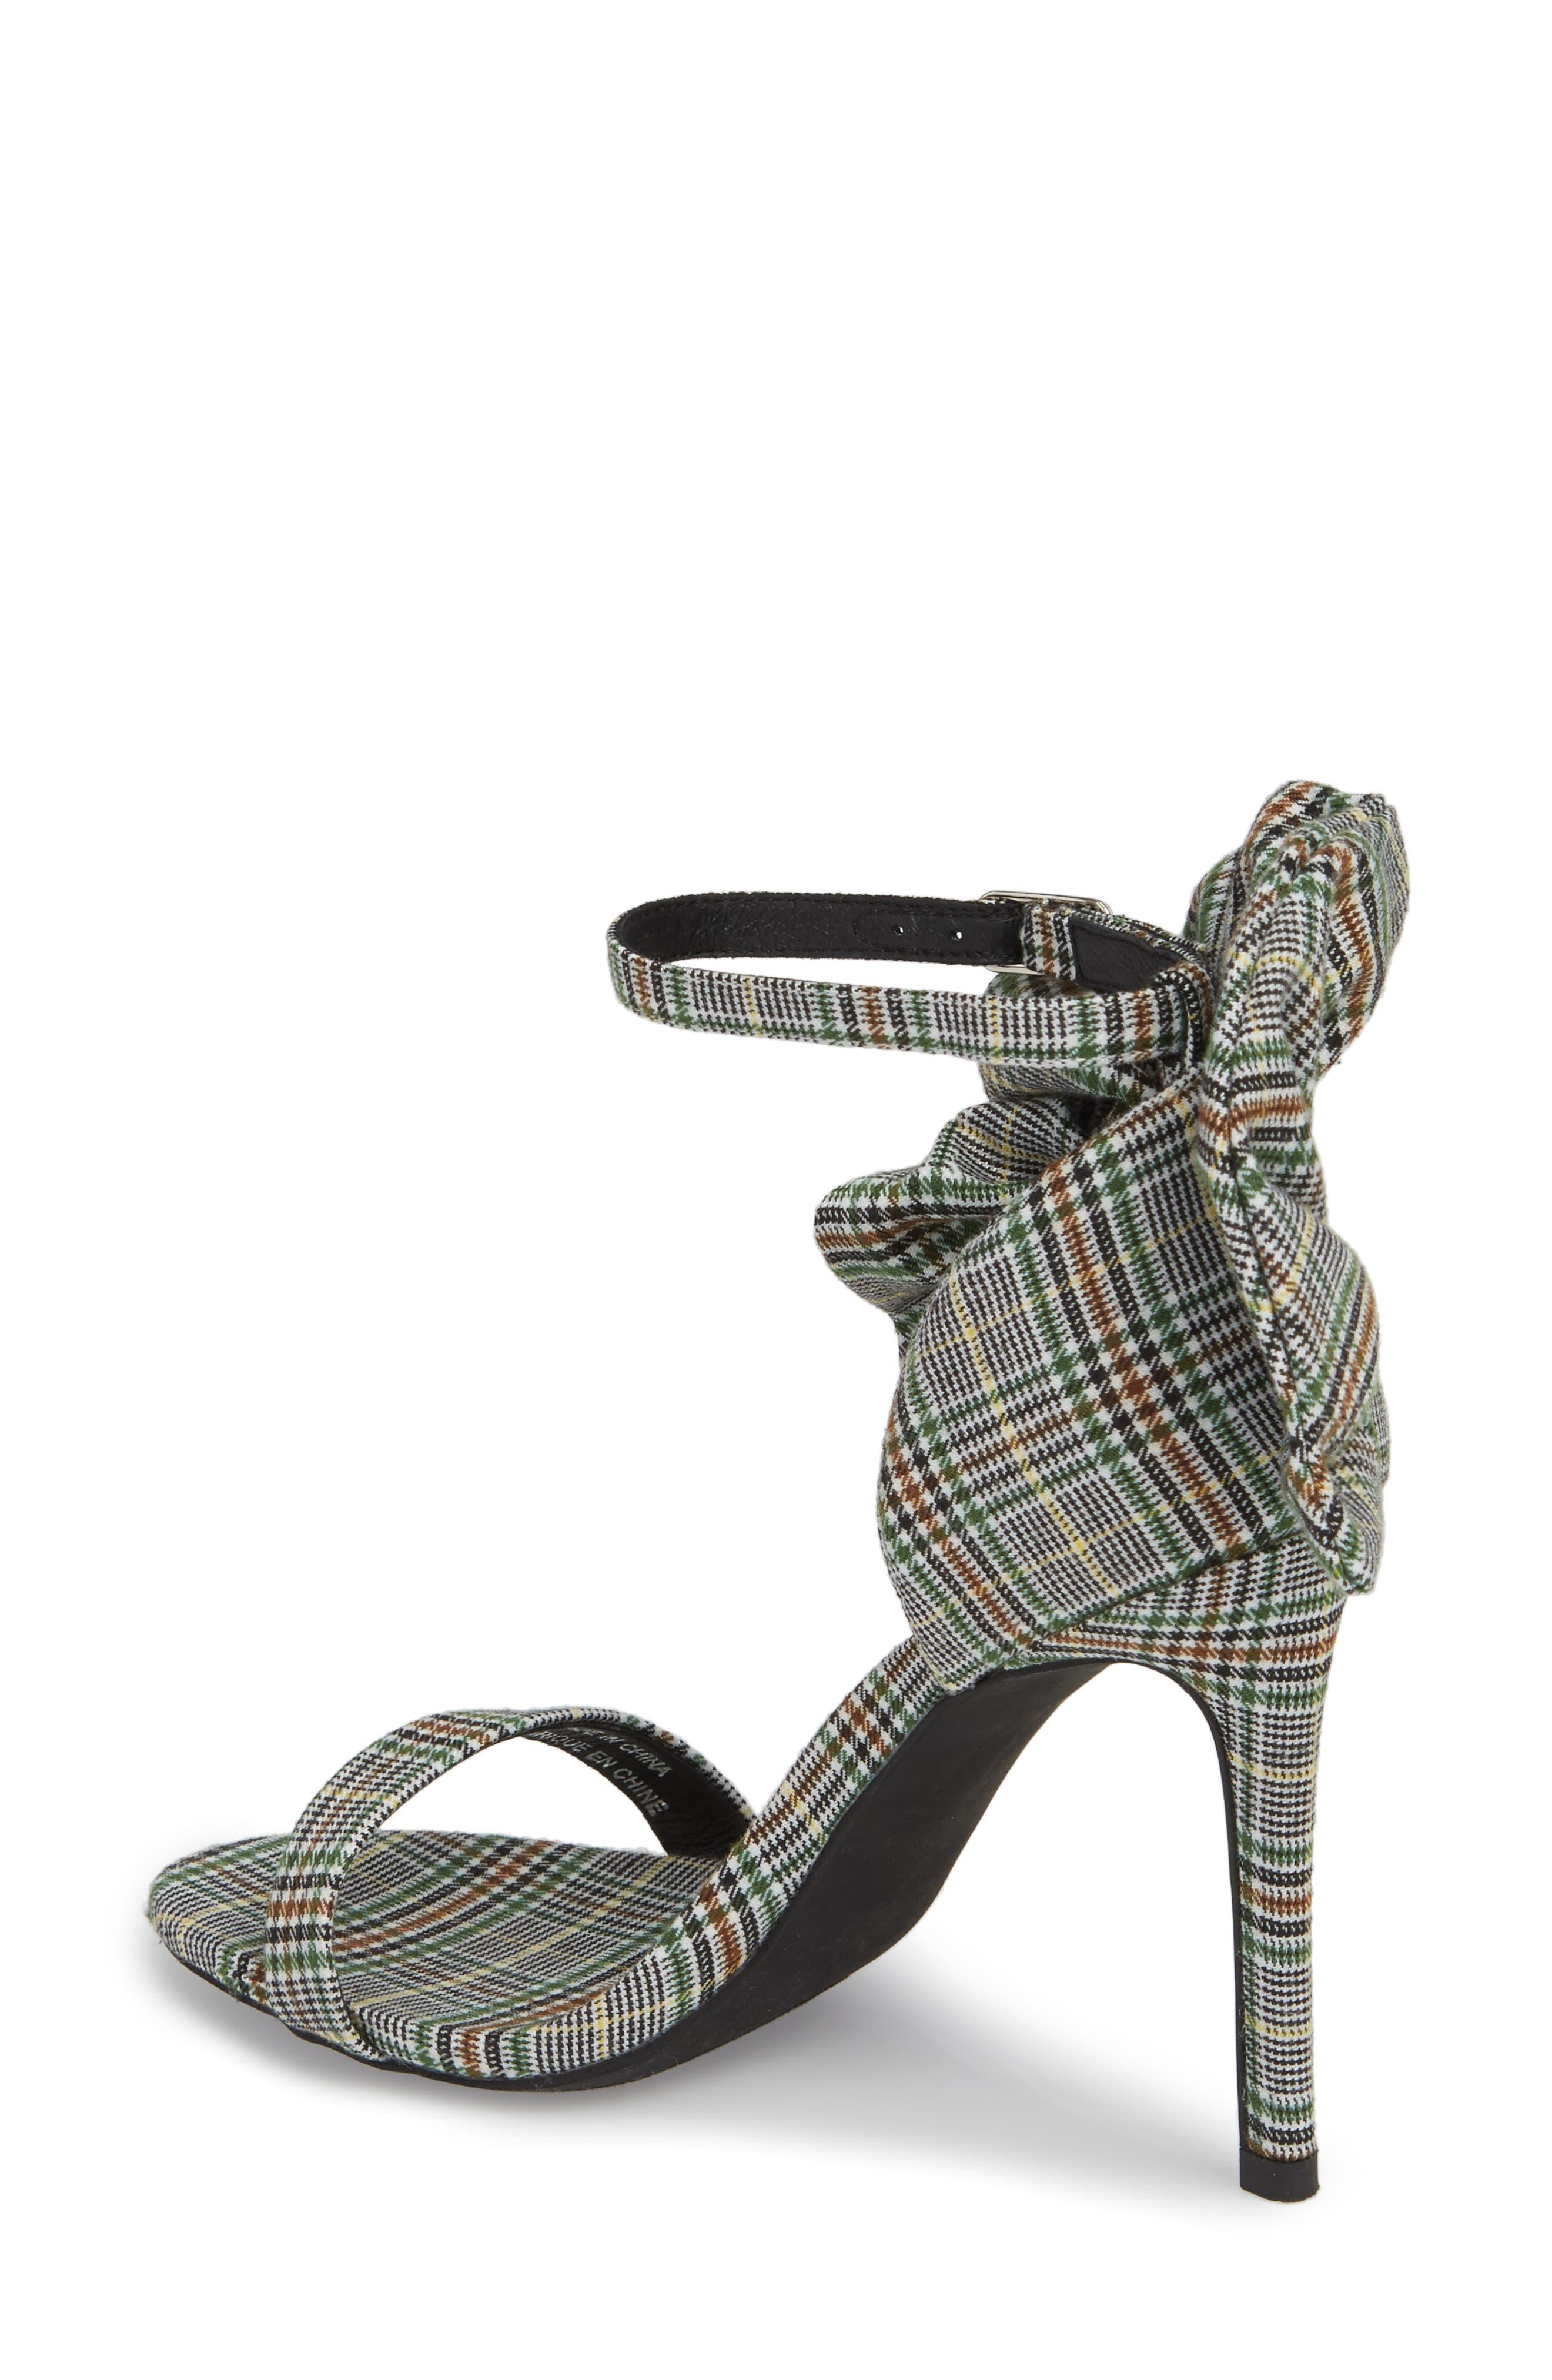 Cheshire Ruffle Sandal,                             Alternate thumbnail 2, color,                             Black/ White/ Green Fabric